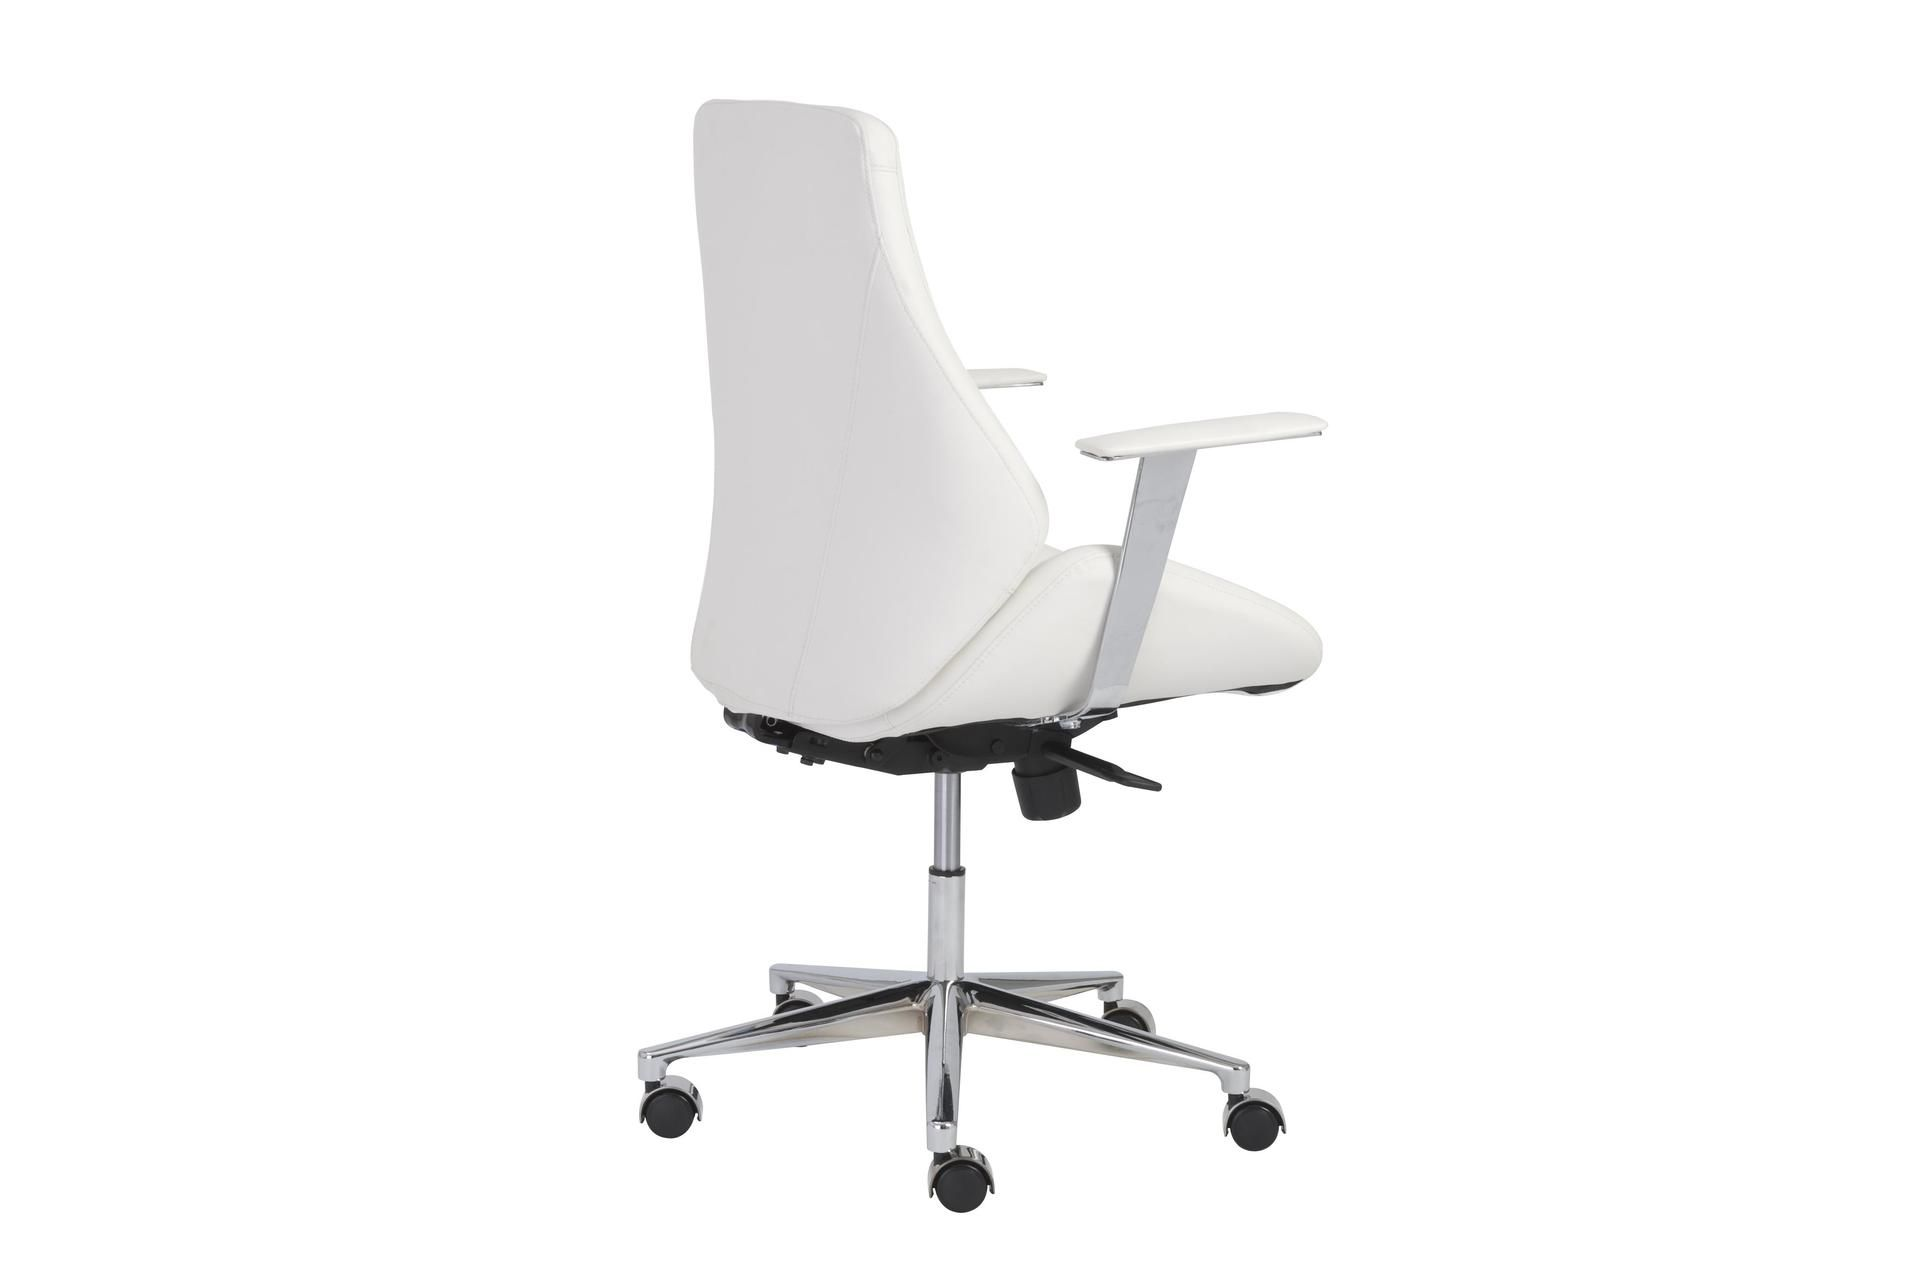 Viborg White Vegan And Chrome Low Back Desk Chair - $595